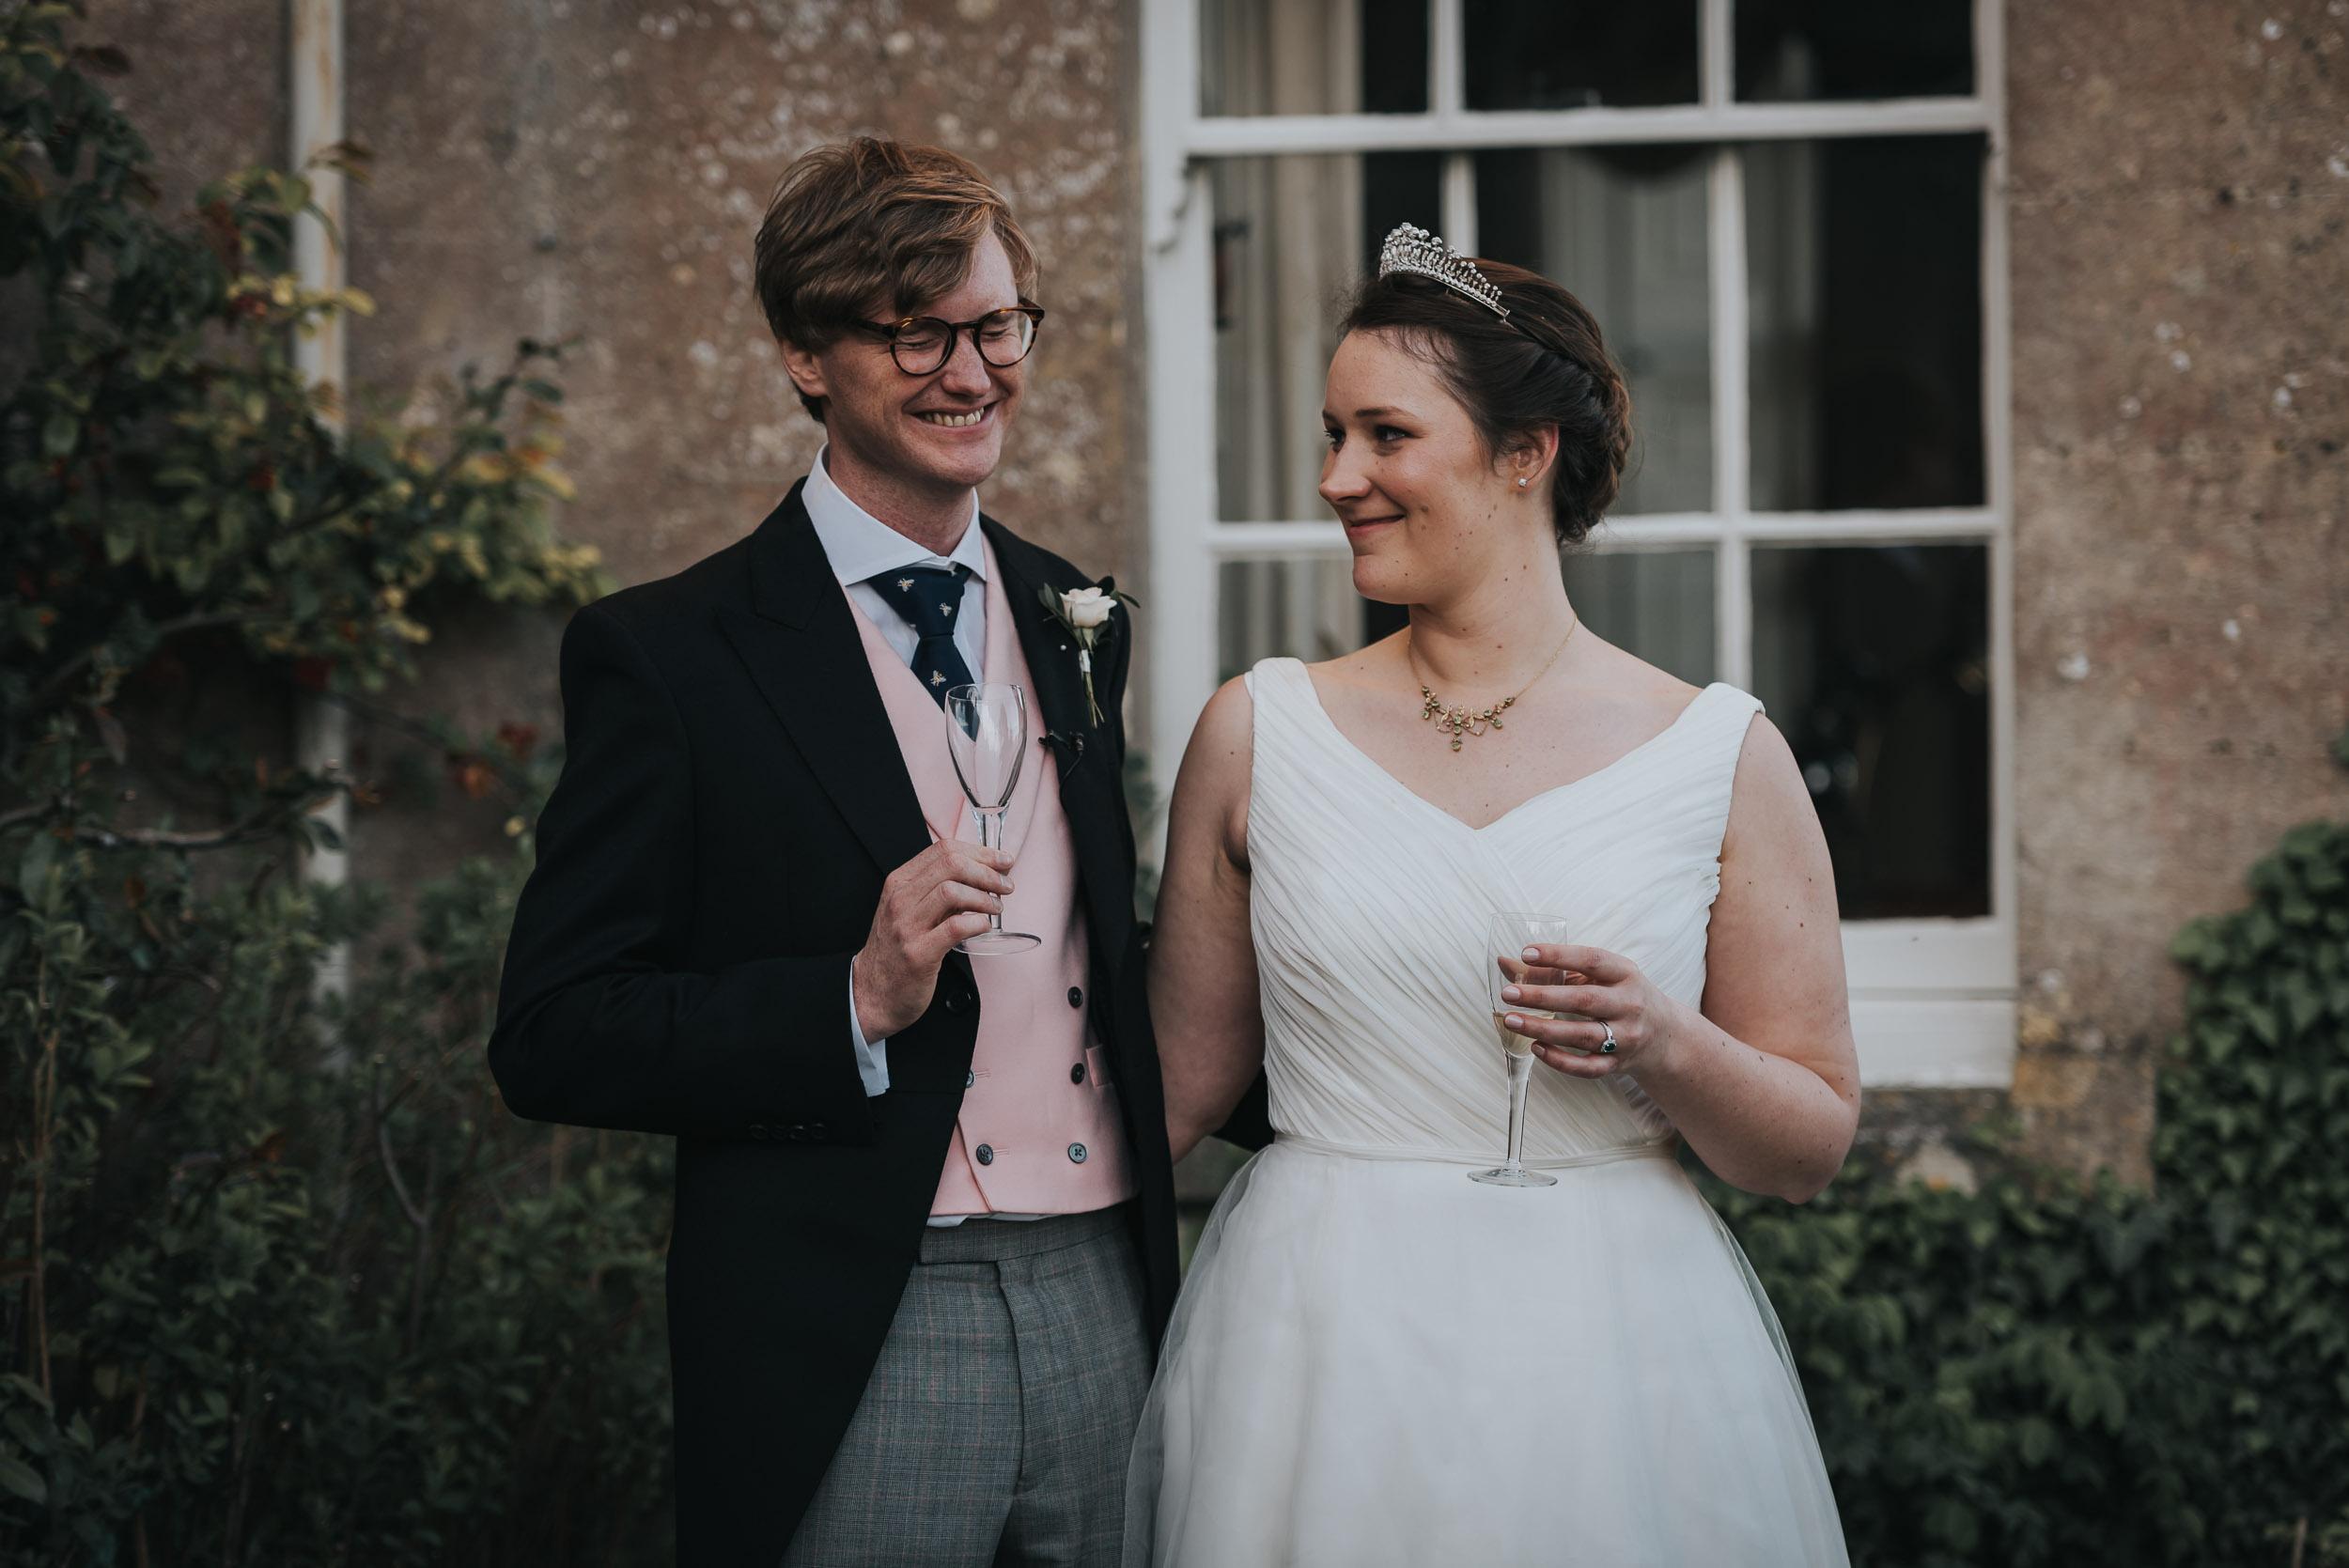 hamswell-house-wedding-photographer-w101.jpg